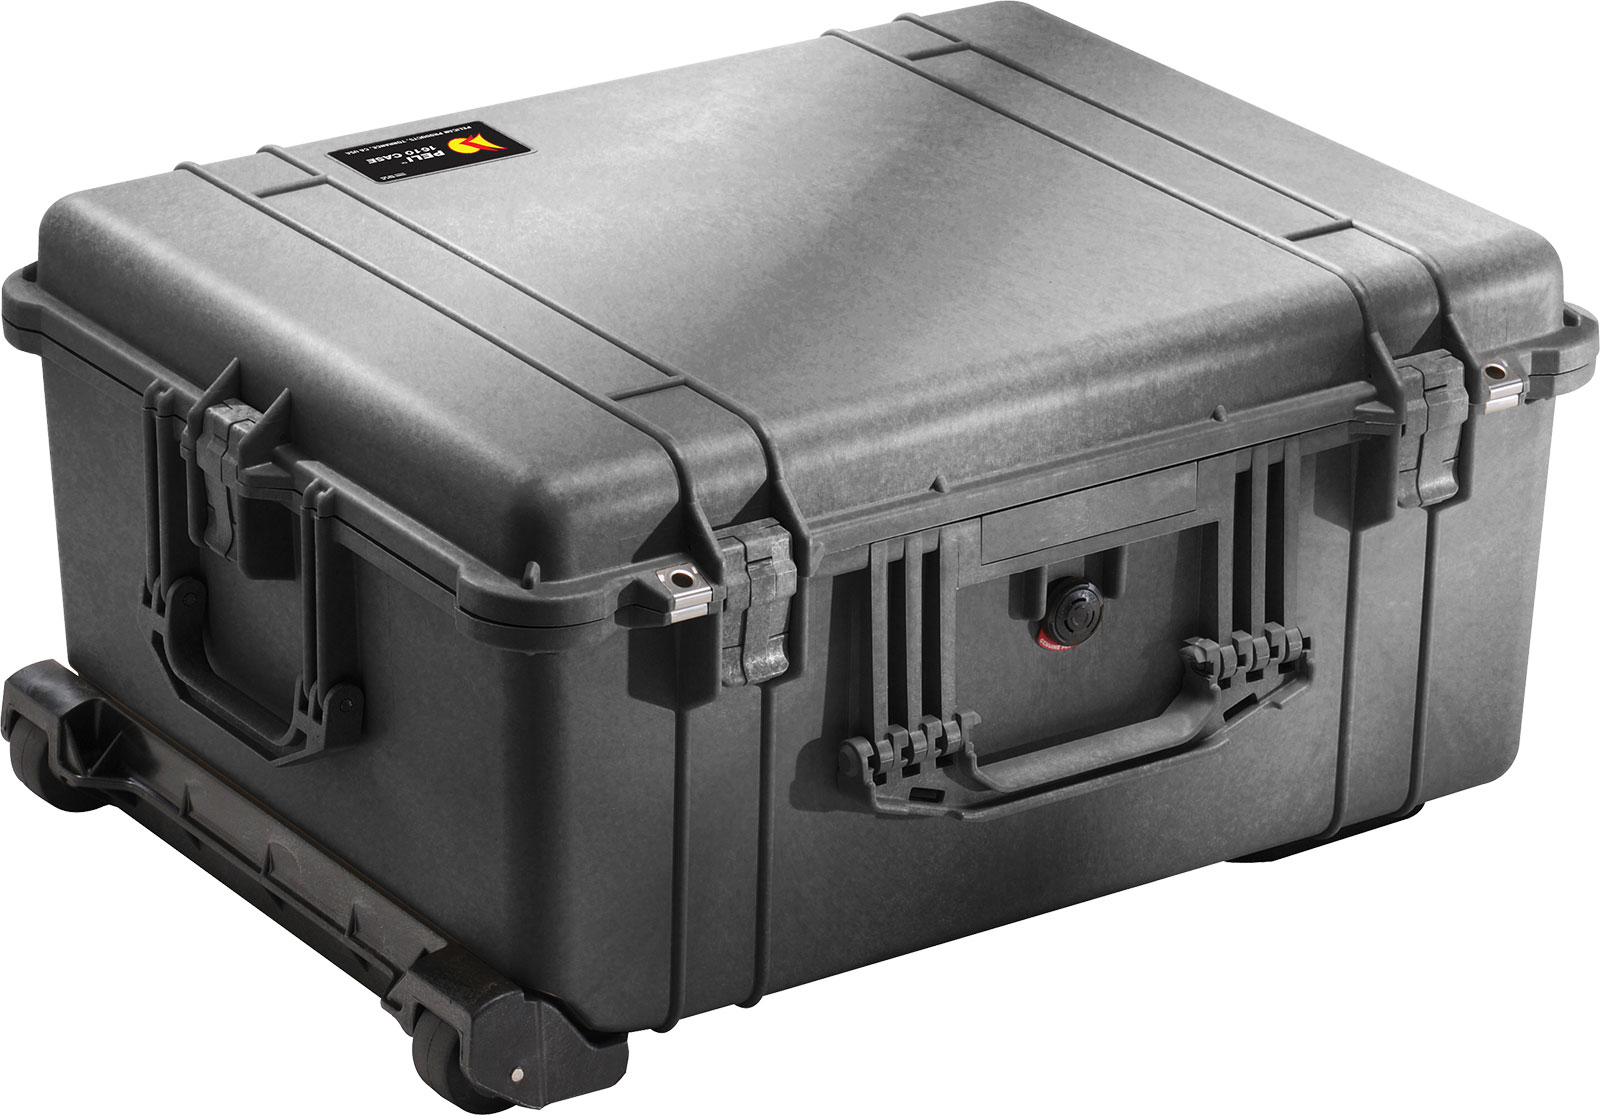 peli protector 1610 case rolling travel cases